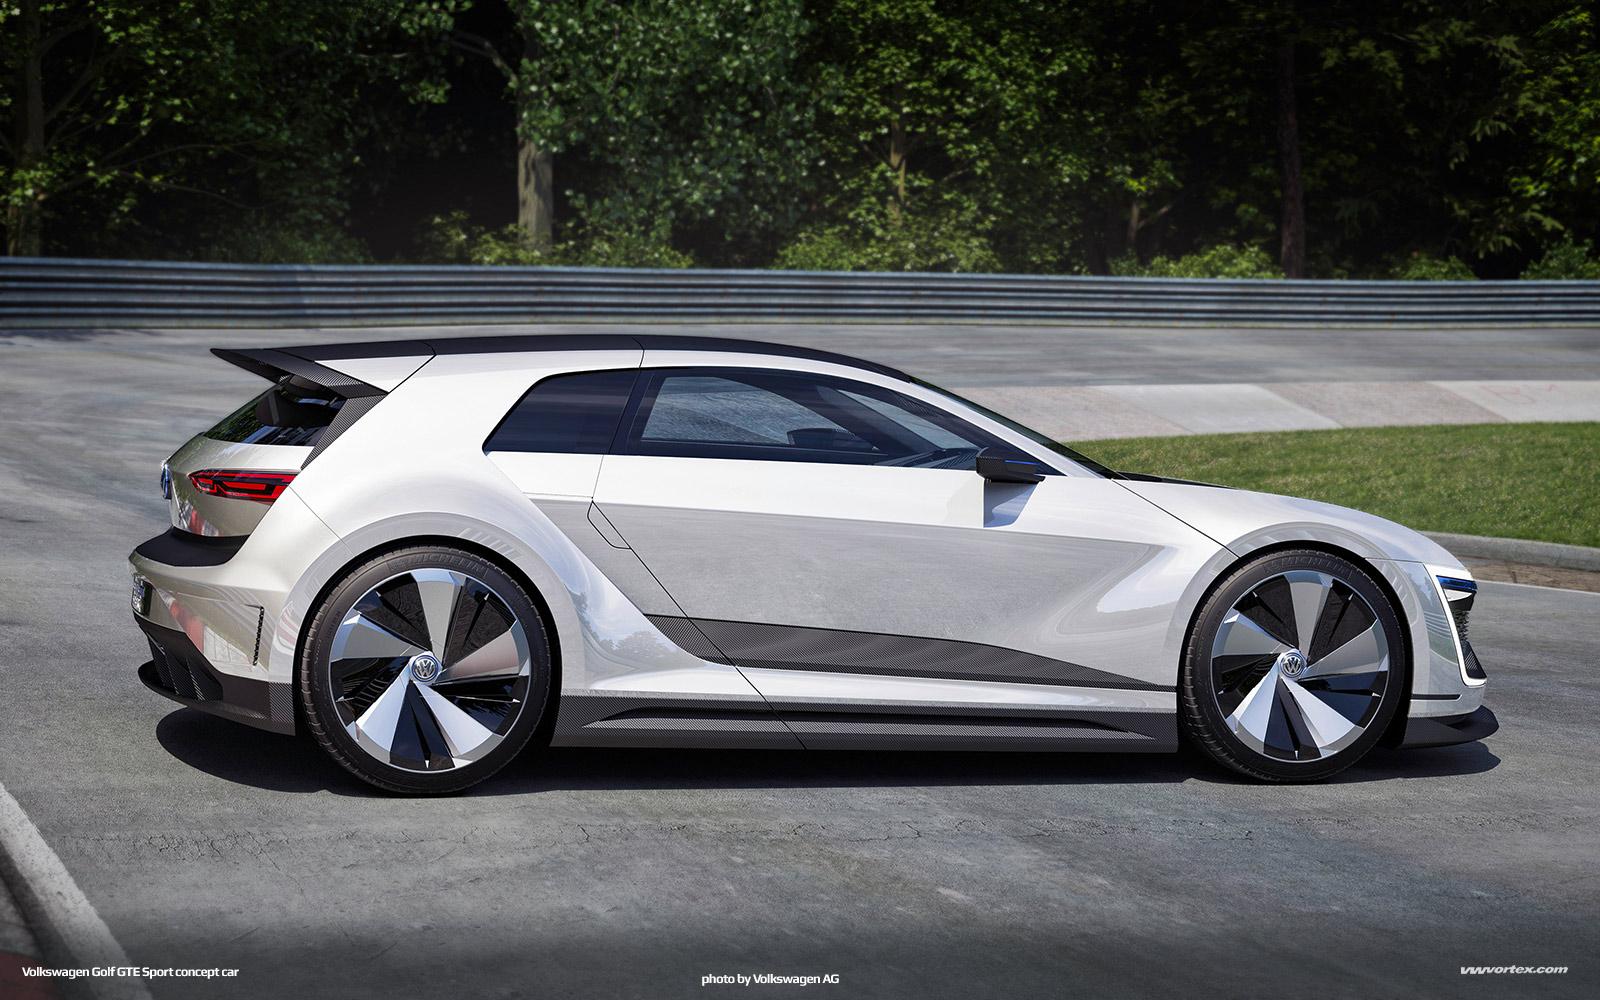 Audi Exclusive S8 in Ipanema Brown (photo: Audi Forum Neckarsulm)